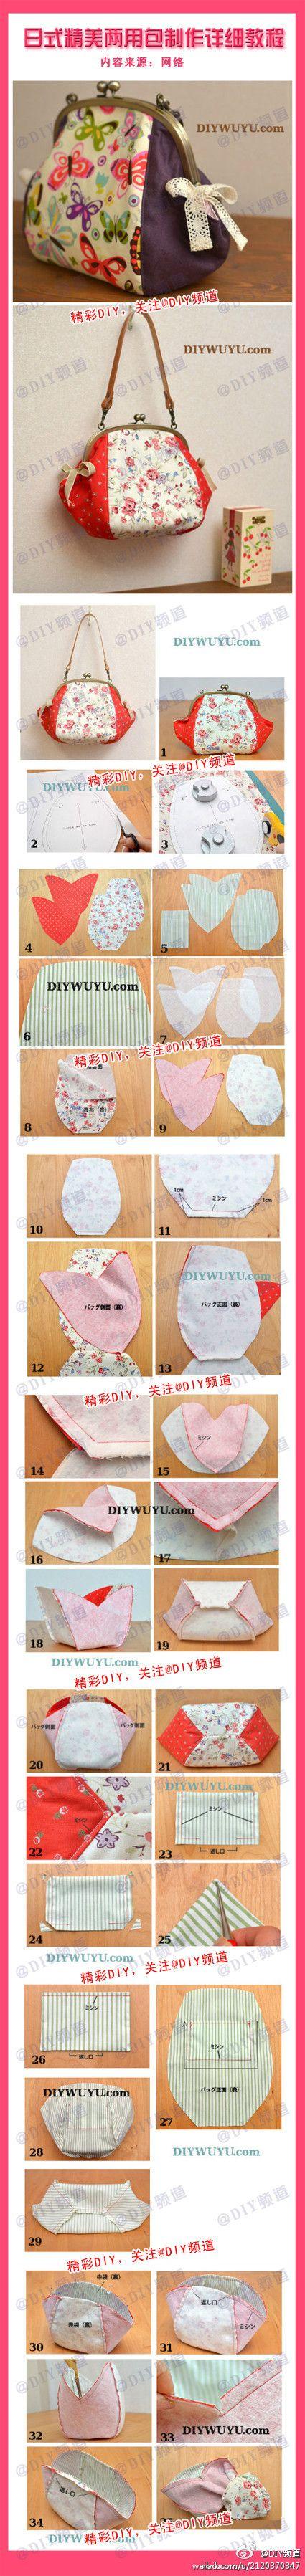 sewn clutch purse